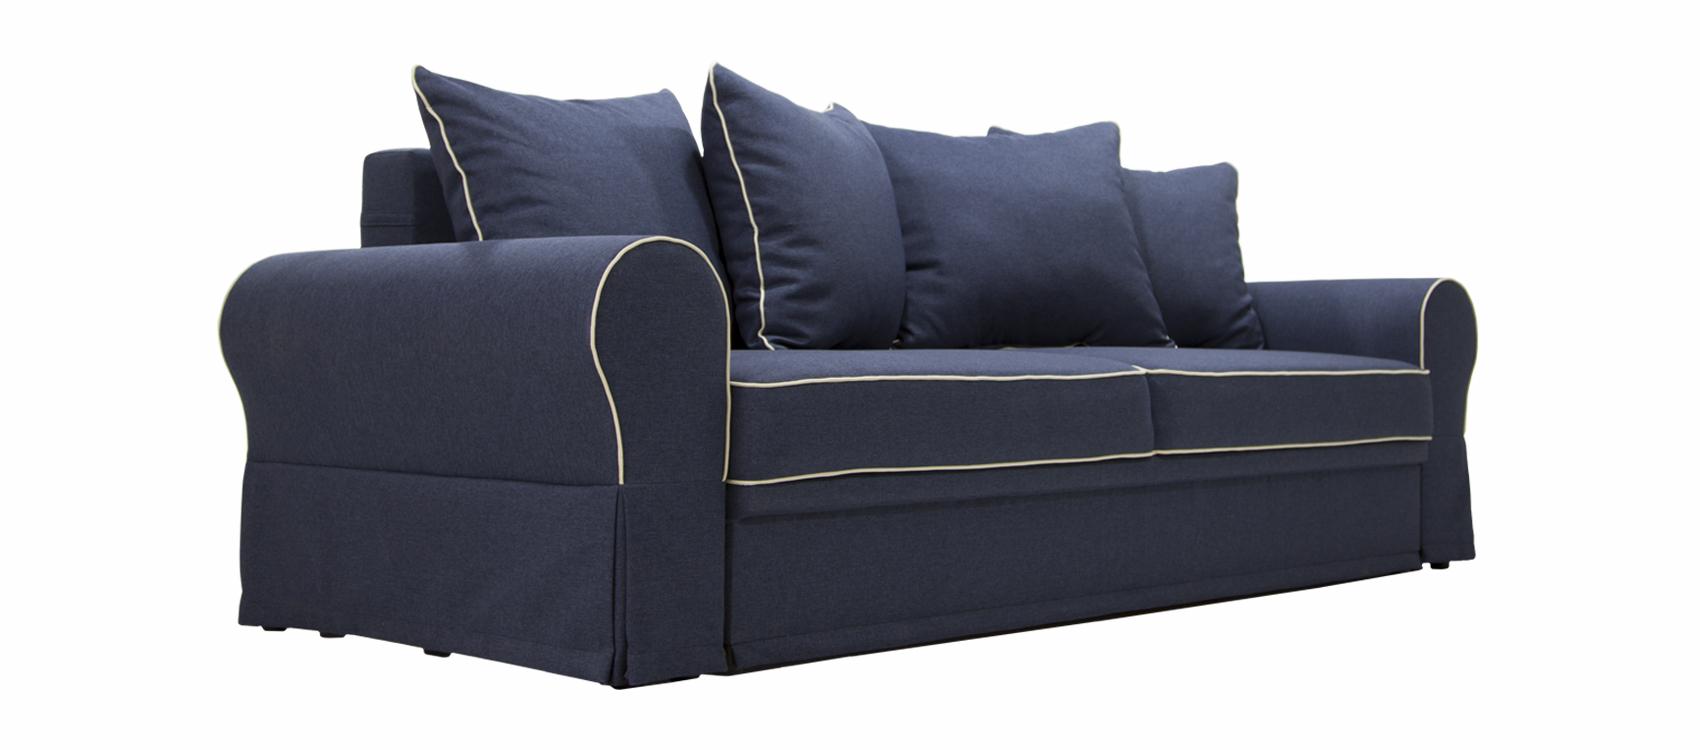 Sofa ALICE фото 10